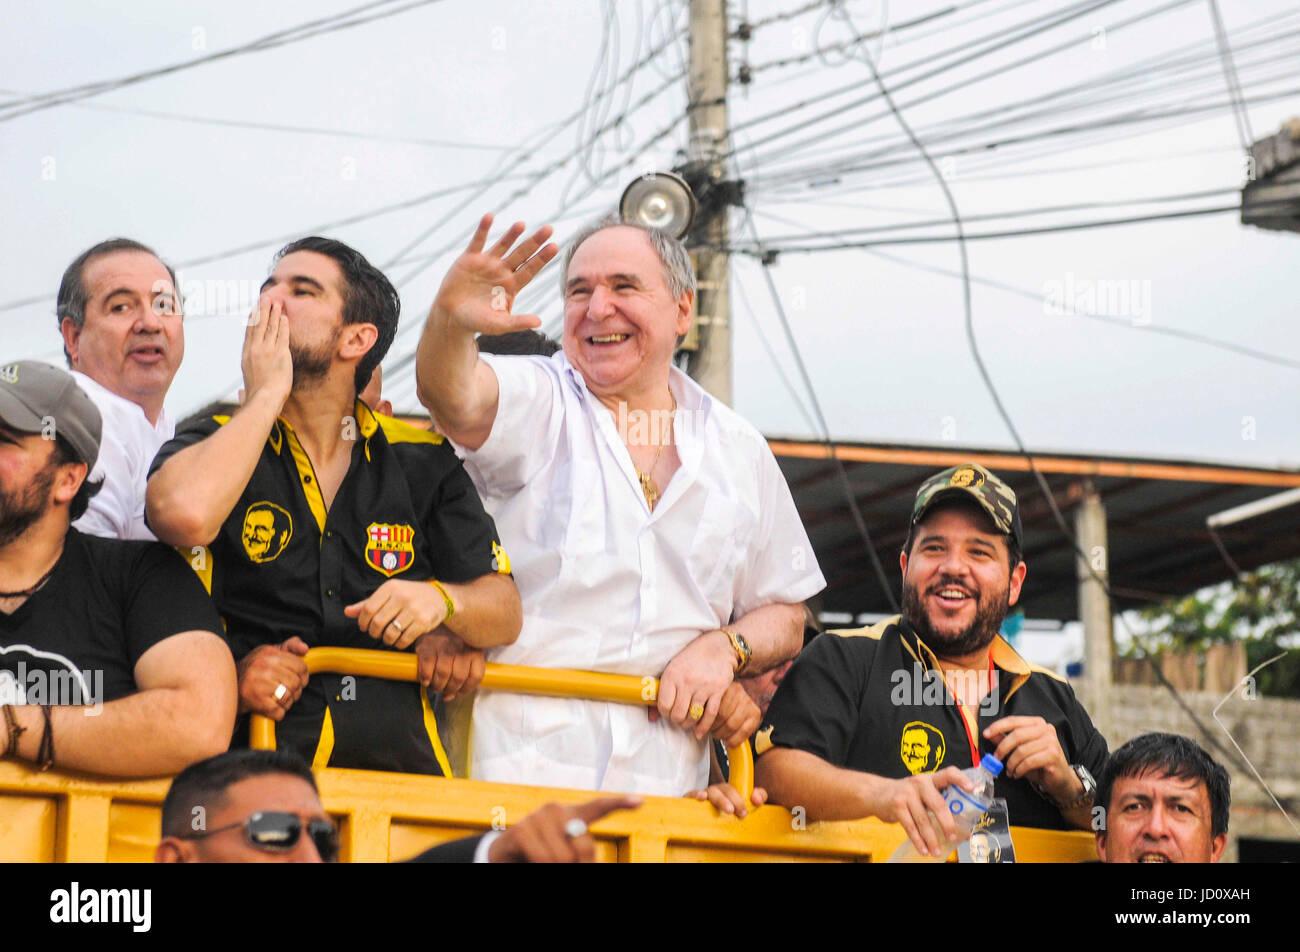 Former Ecuadorian President Abdala Bucaram C Adresses A Speech To Supporters During Rally In Guayaquil Ecuador 17 June 2017